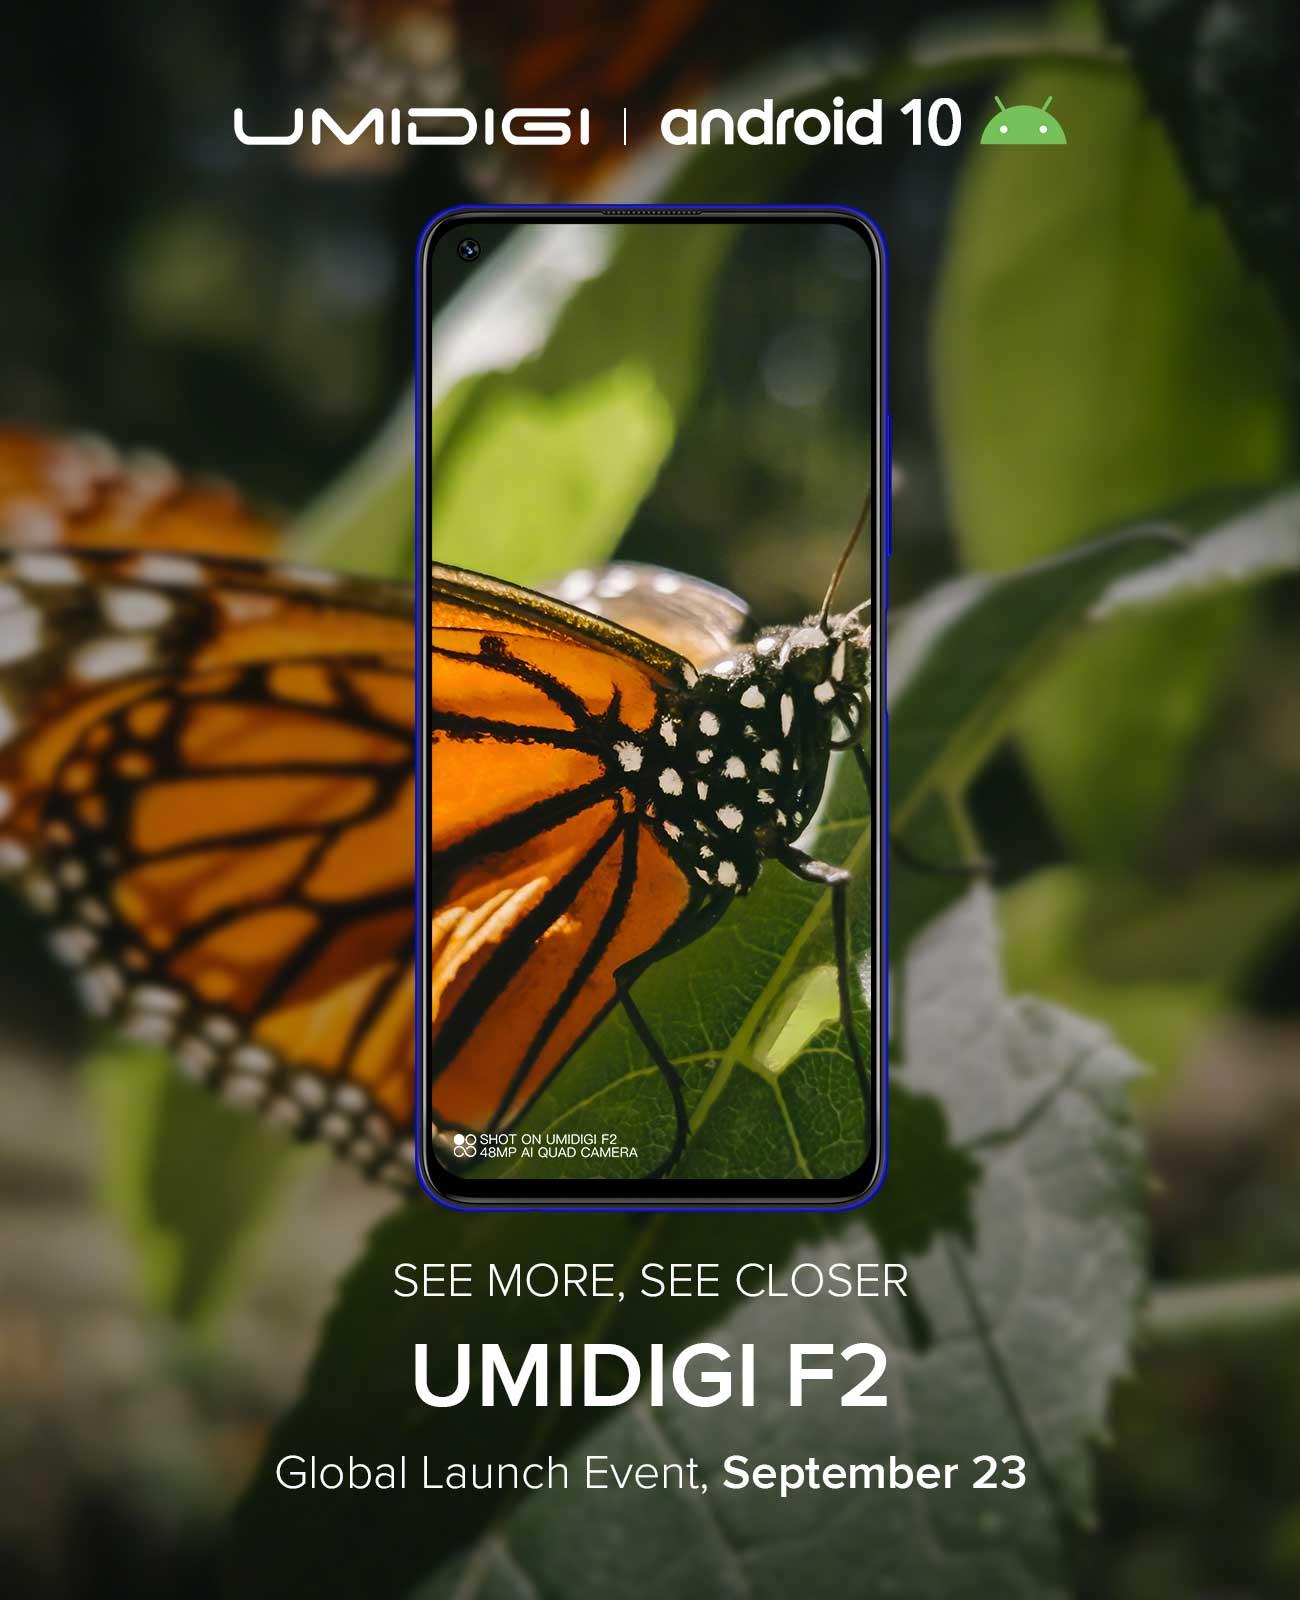 UMiDigi F2 Android 10